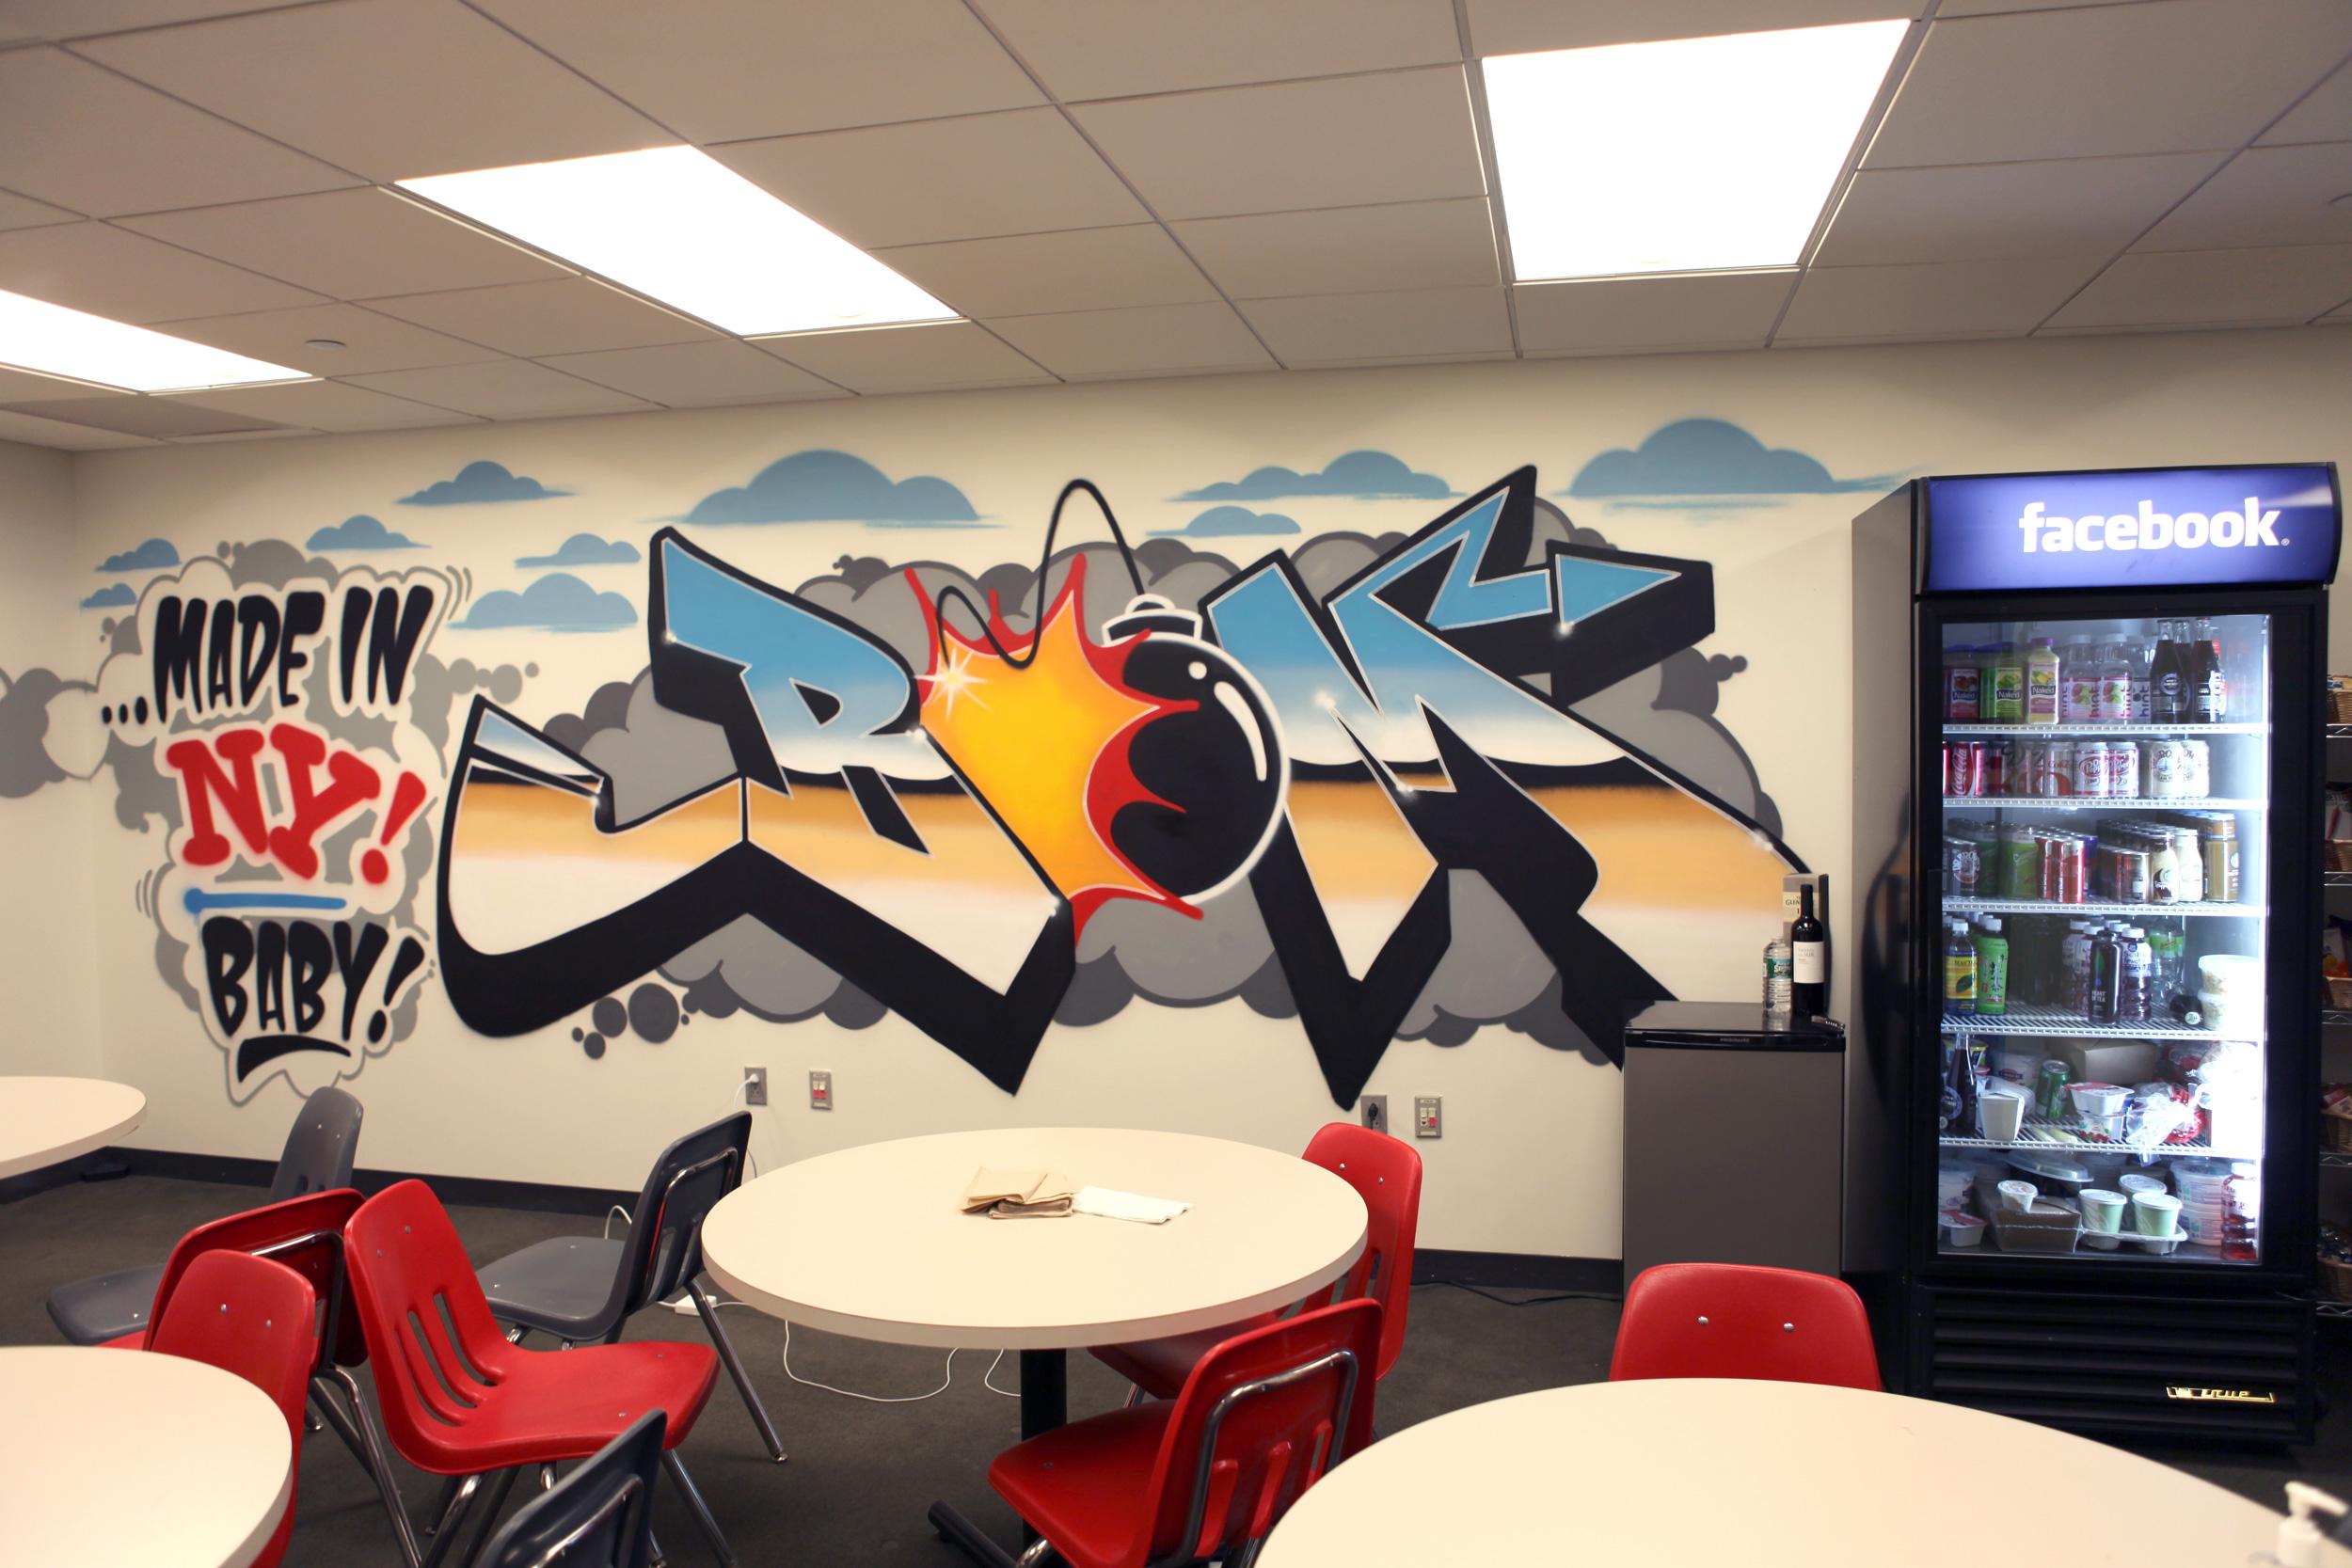 New York Facebook Office Graffiti Art Graffiti Usa